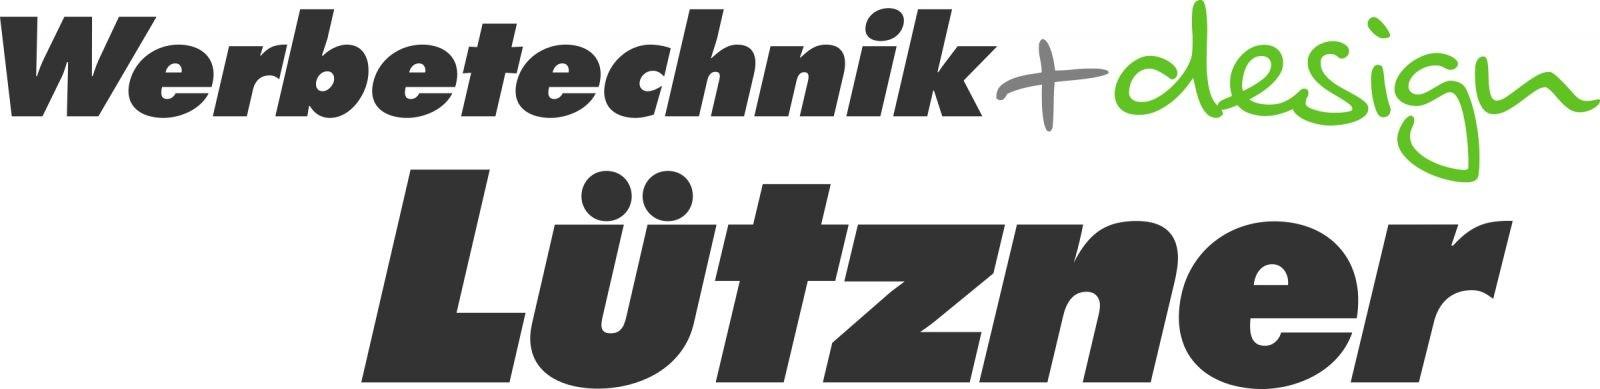 Werbetechnik + Design Michaela Lützner